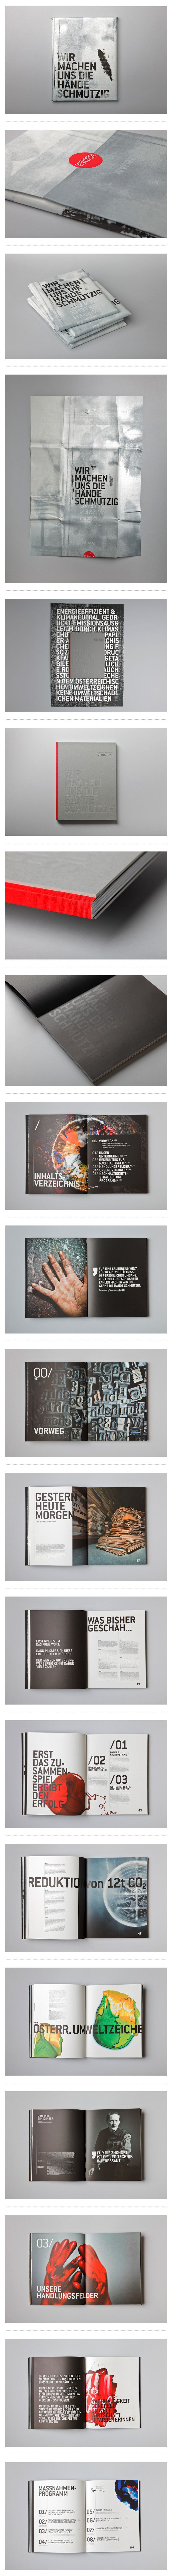 SUSTAINABILITY REPORT #layout #publication